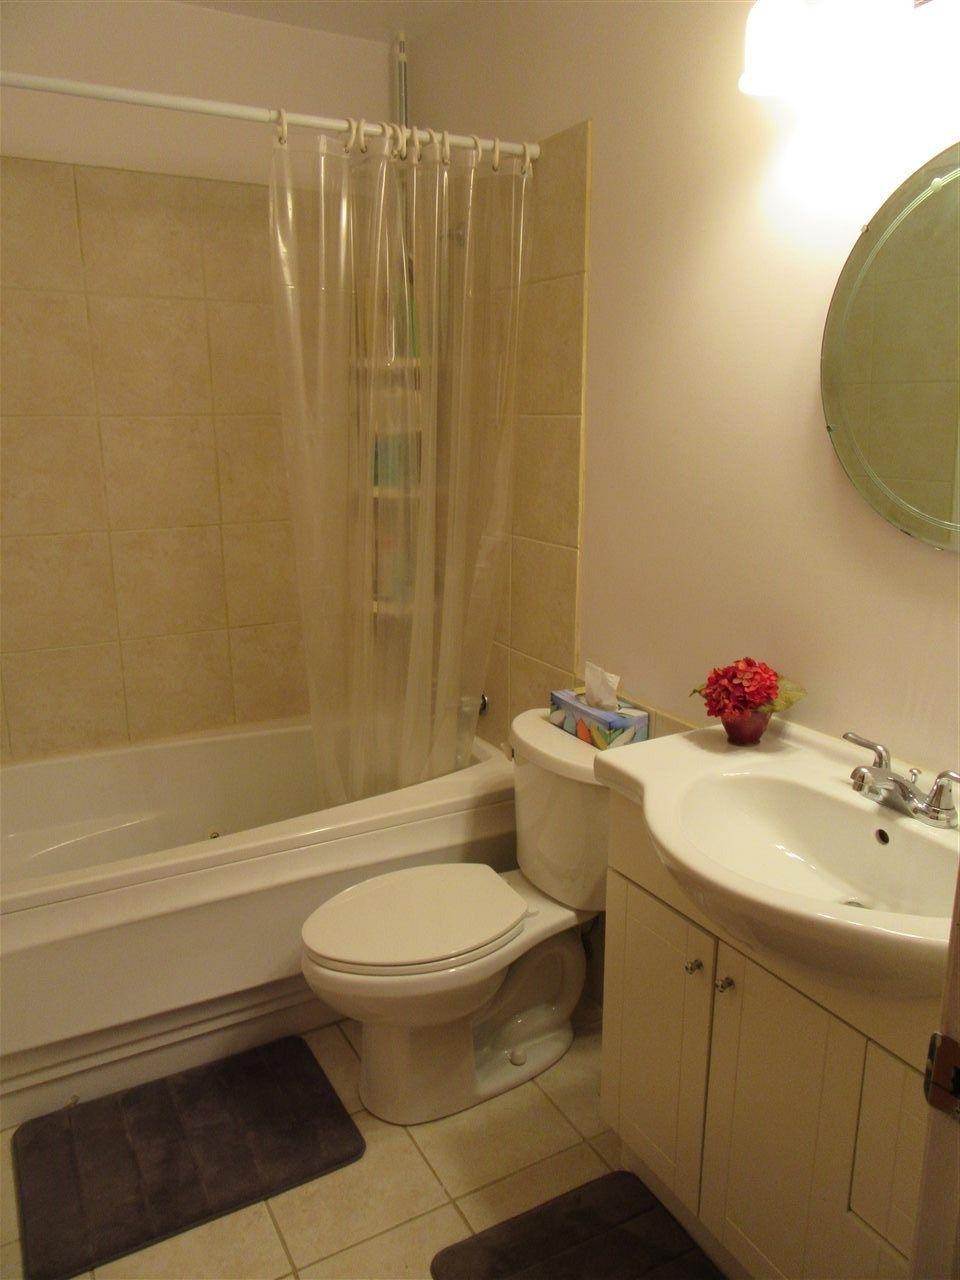 Photo 12: Photos: 522 RADCLIFFE Drive: Quinson House for sale (PG City West (Zone 71))  : MLS®# R2433646